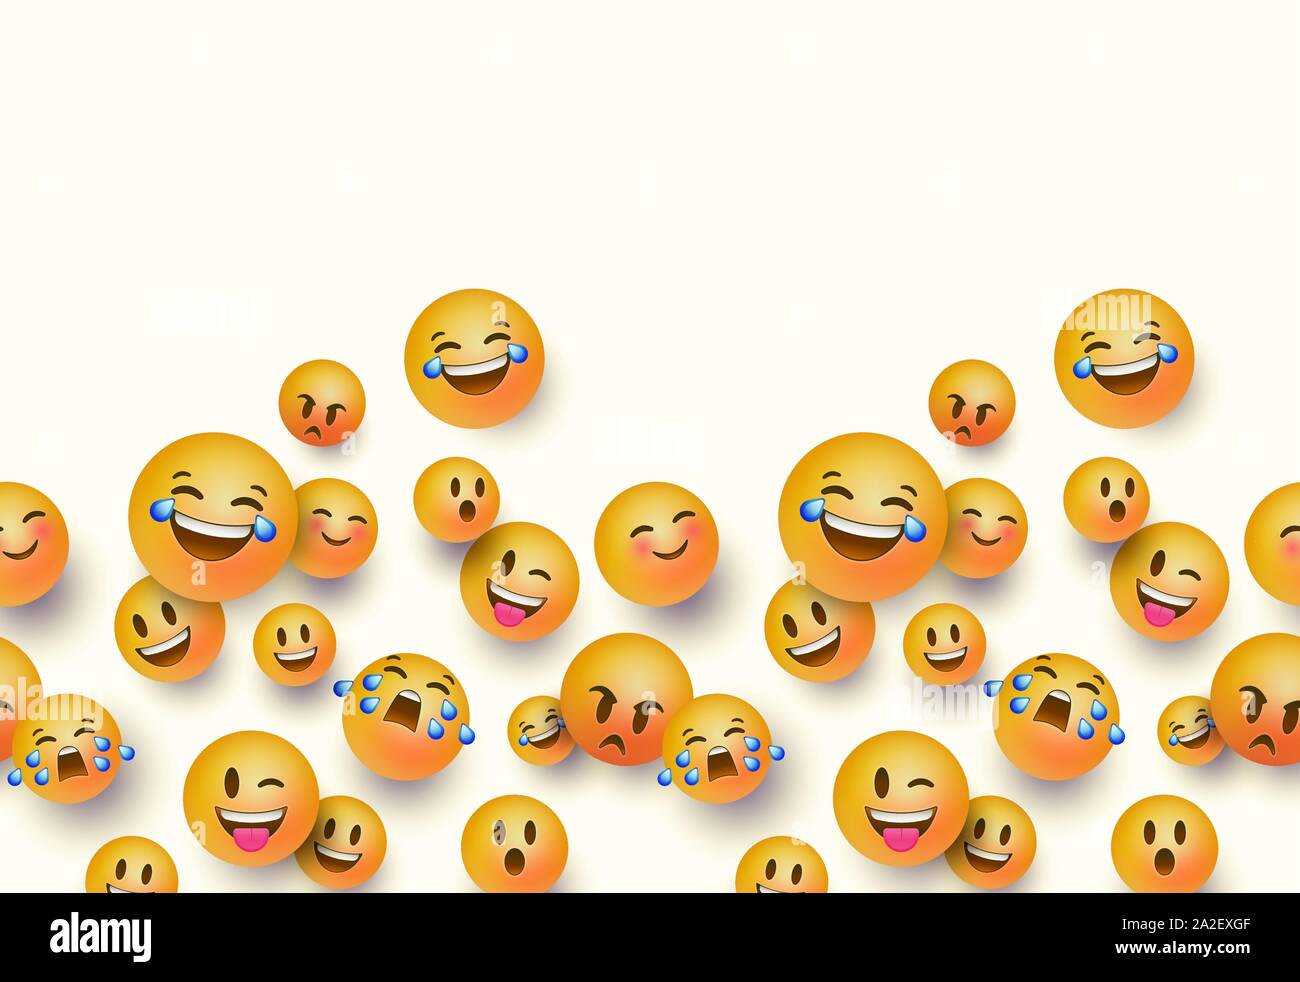 Fun 3d Yellow Emoticon Face Seamless Pattern On White